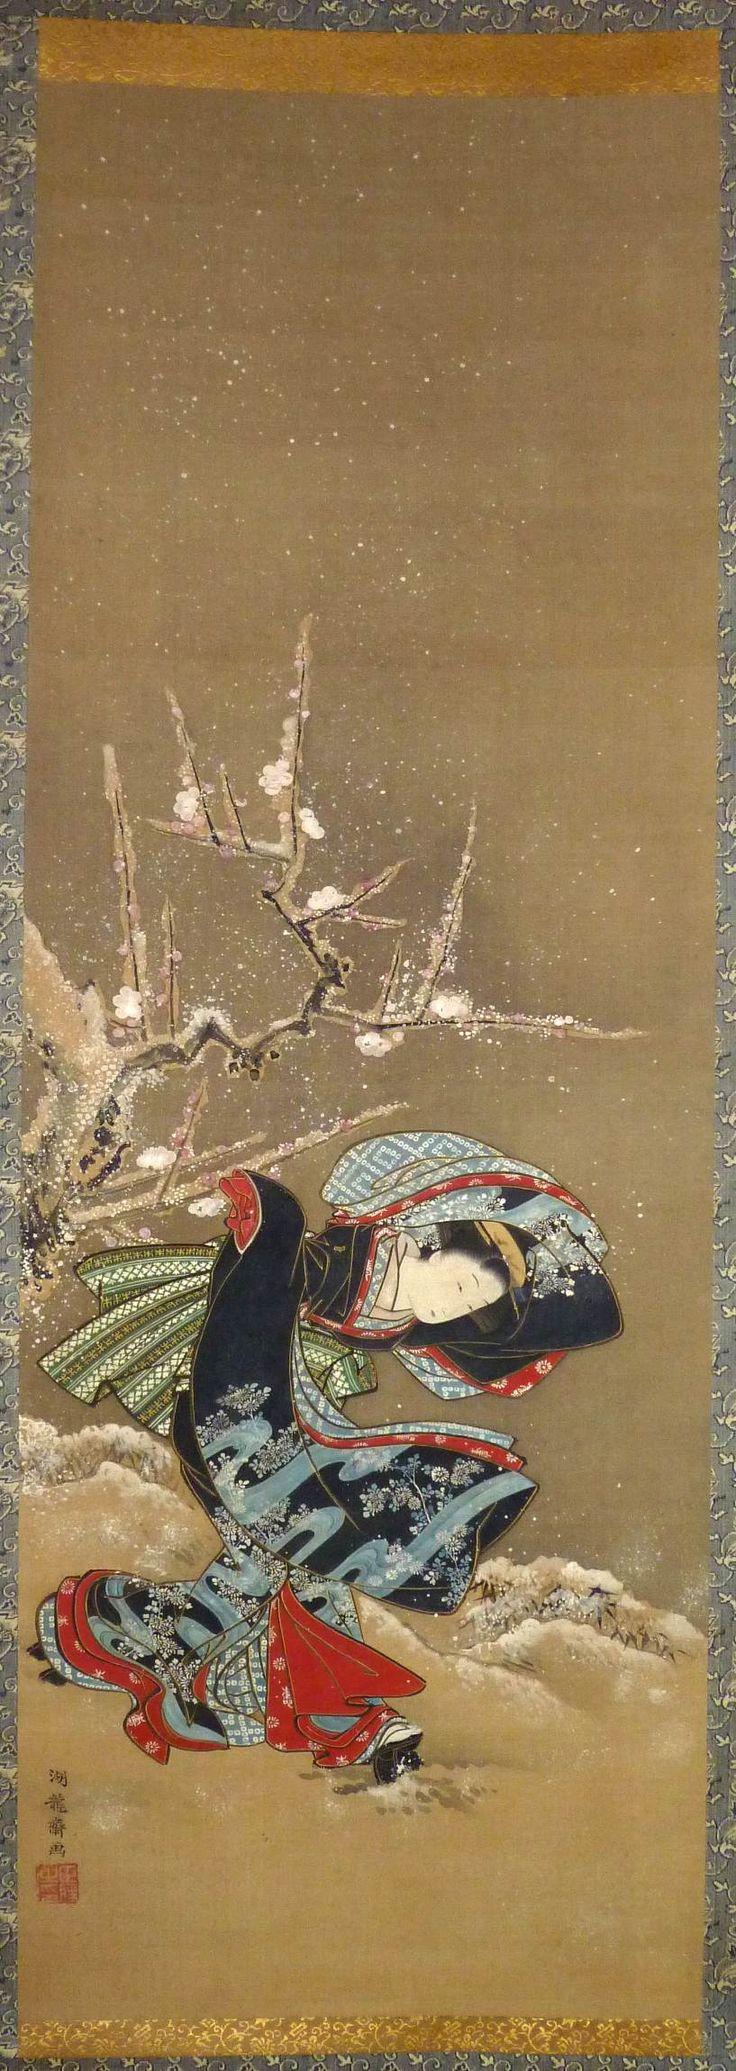 isoda-koryusai-1764-1788-paintings-98.jpg (817×2300)